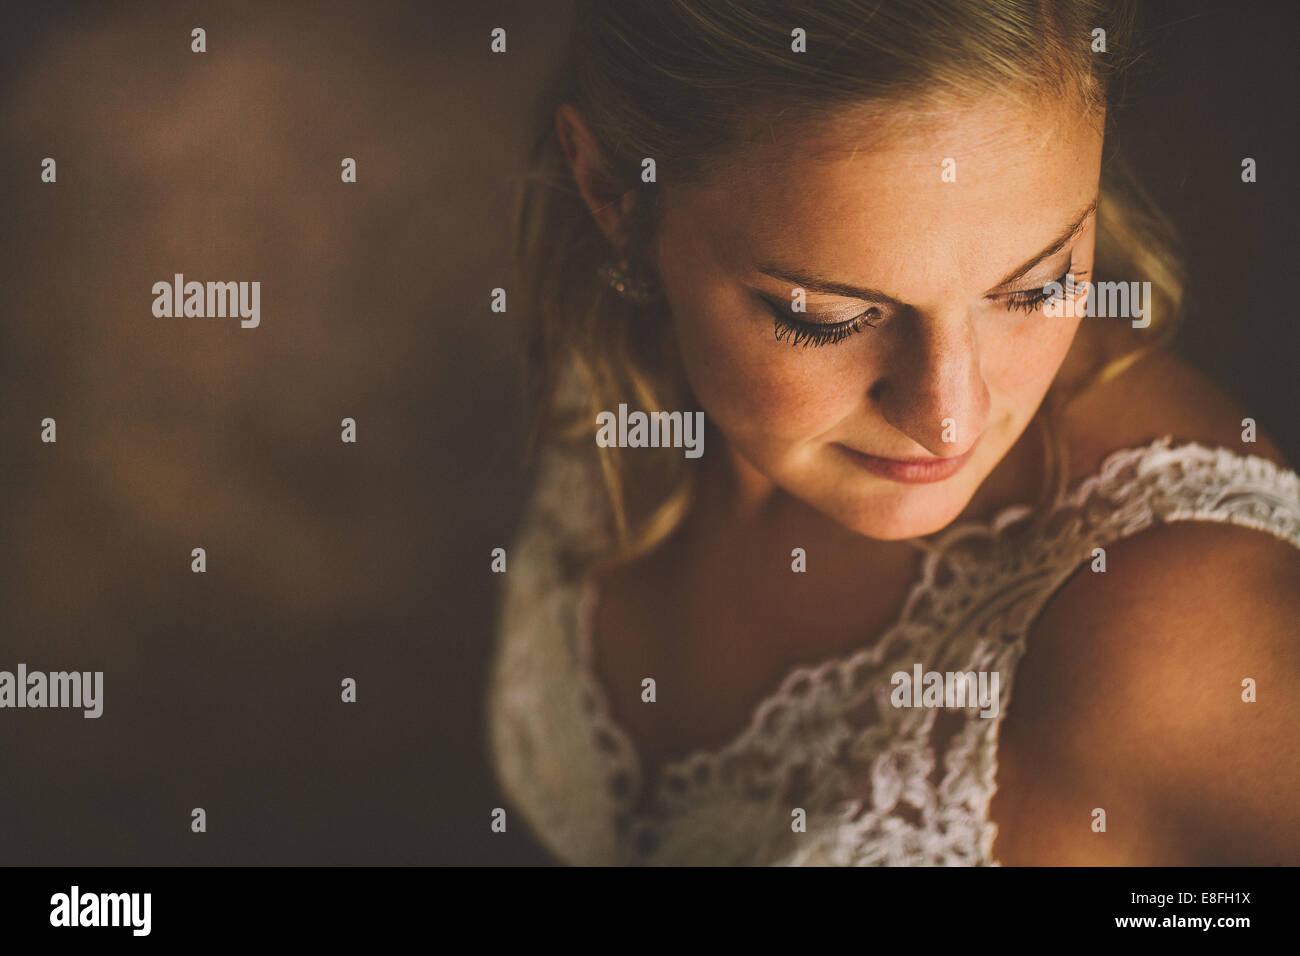 USA, Florida, Bay County, Bayou George, Portrait of bride - Stock Image